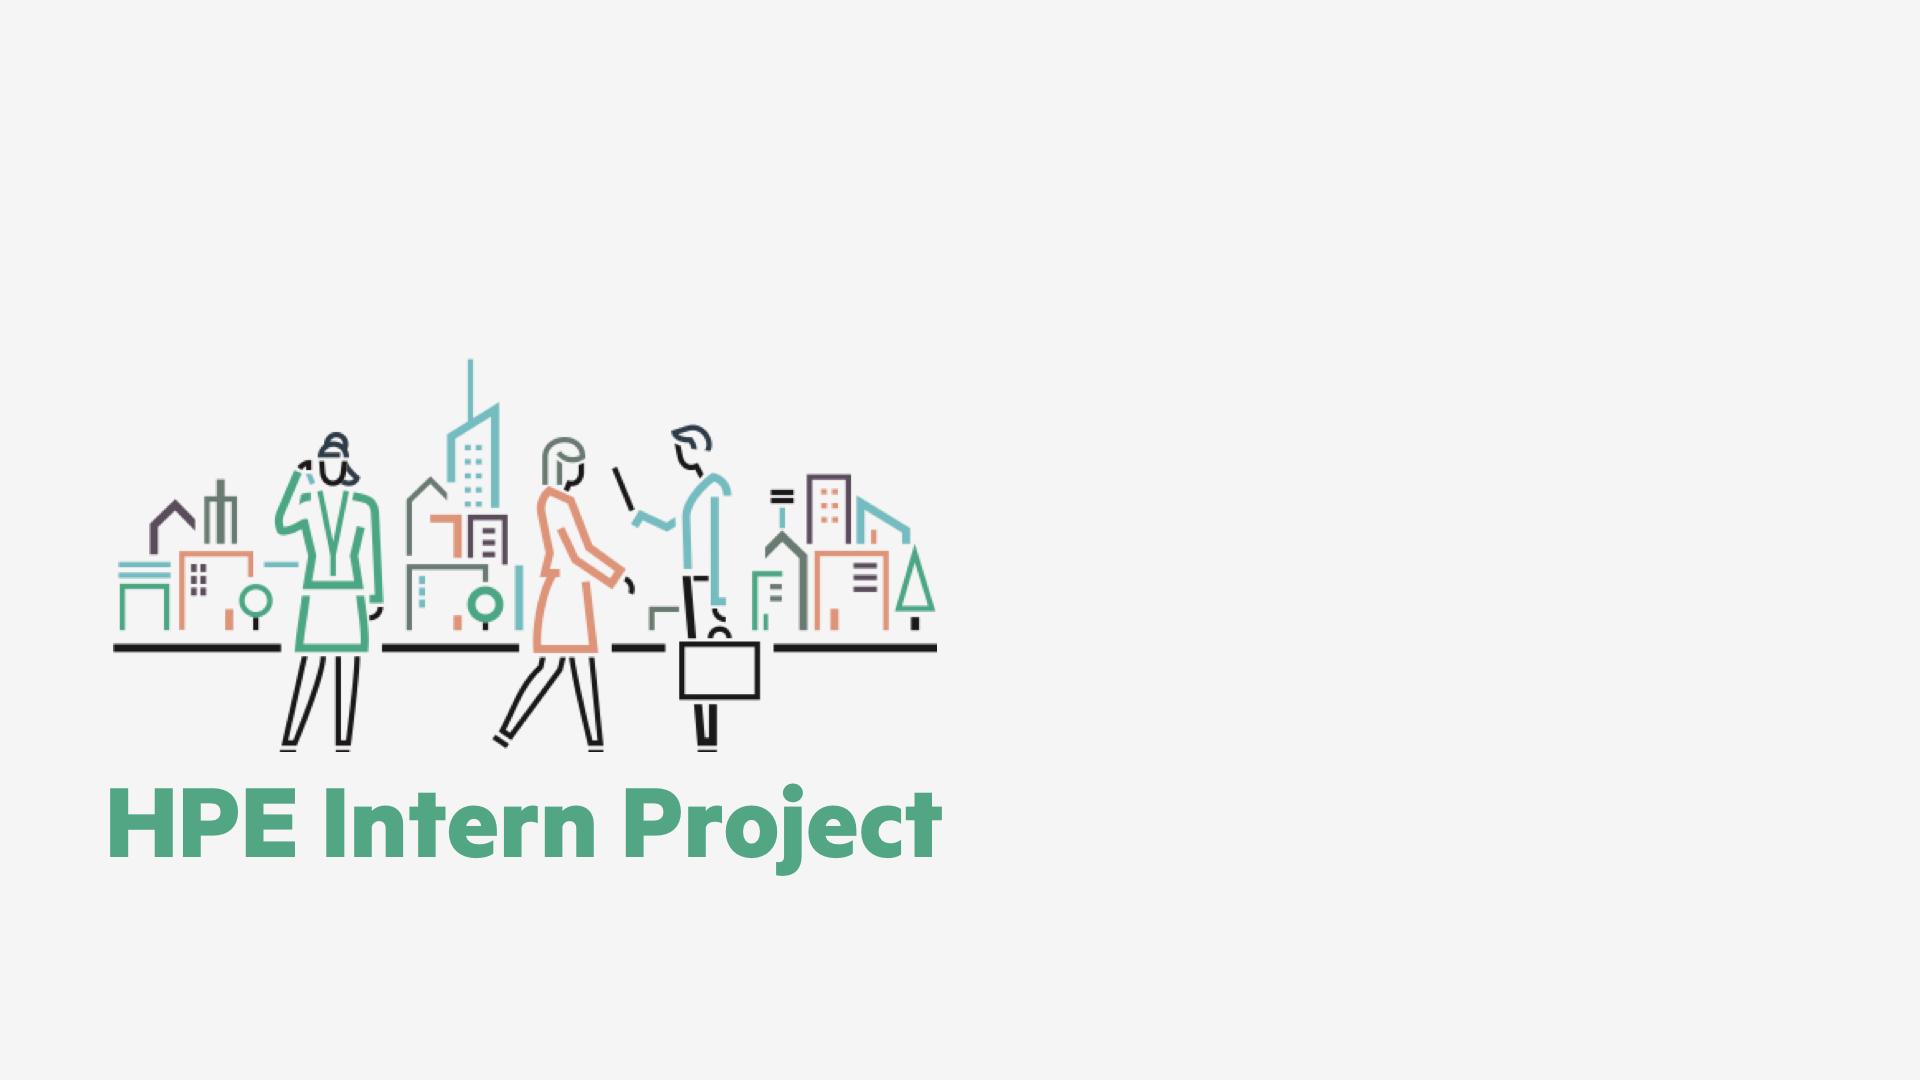 HPE Intern Project_Team3.001.jpeg